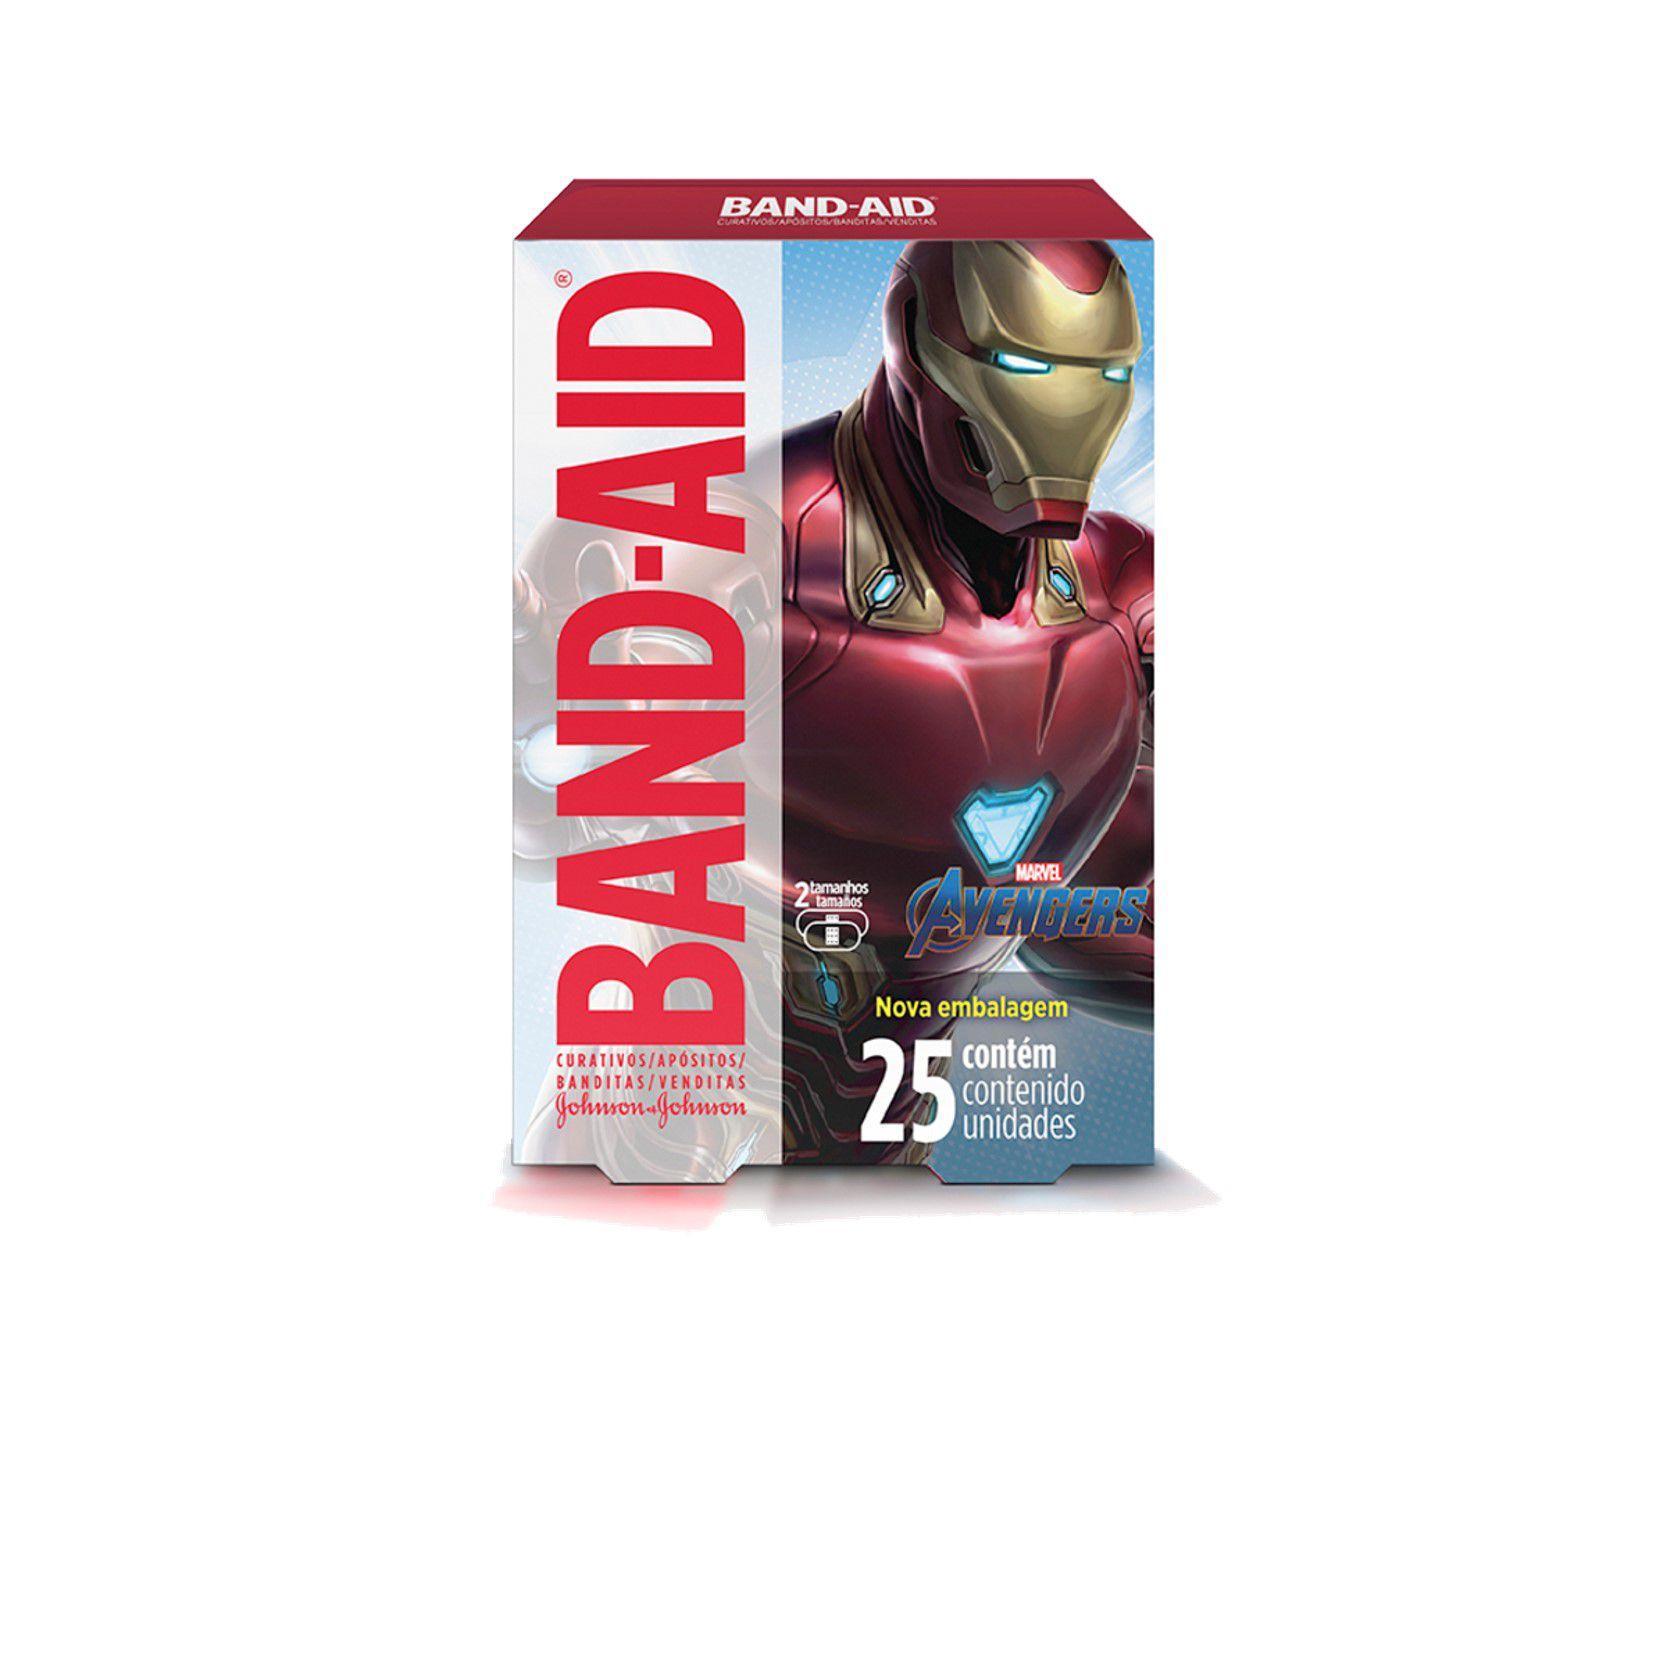 Curativos Band-Aid Avengers 25 Unidades